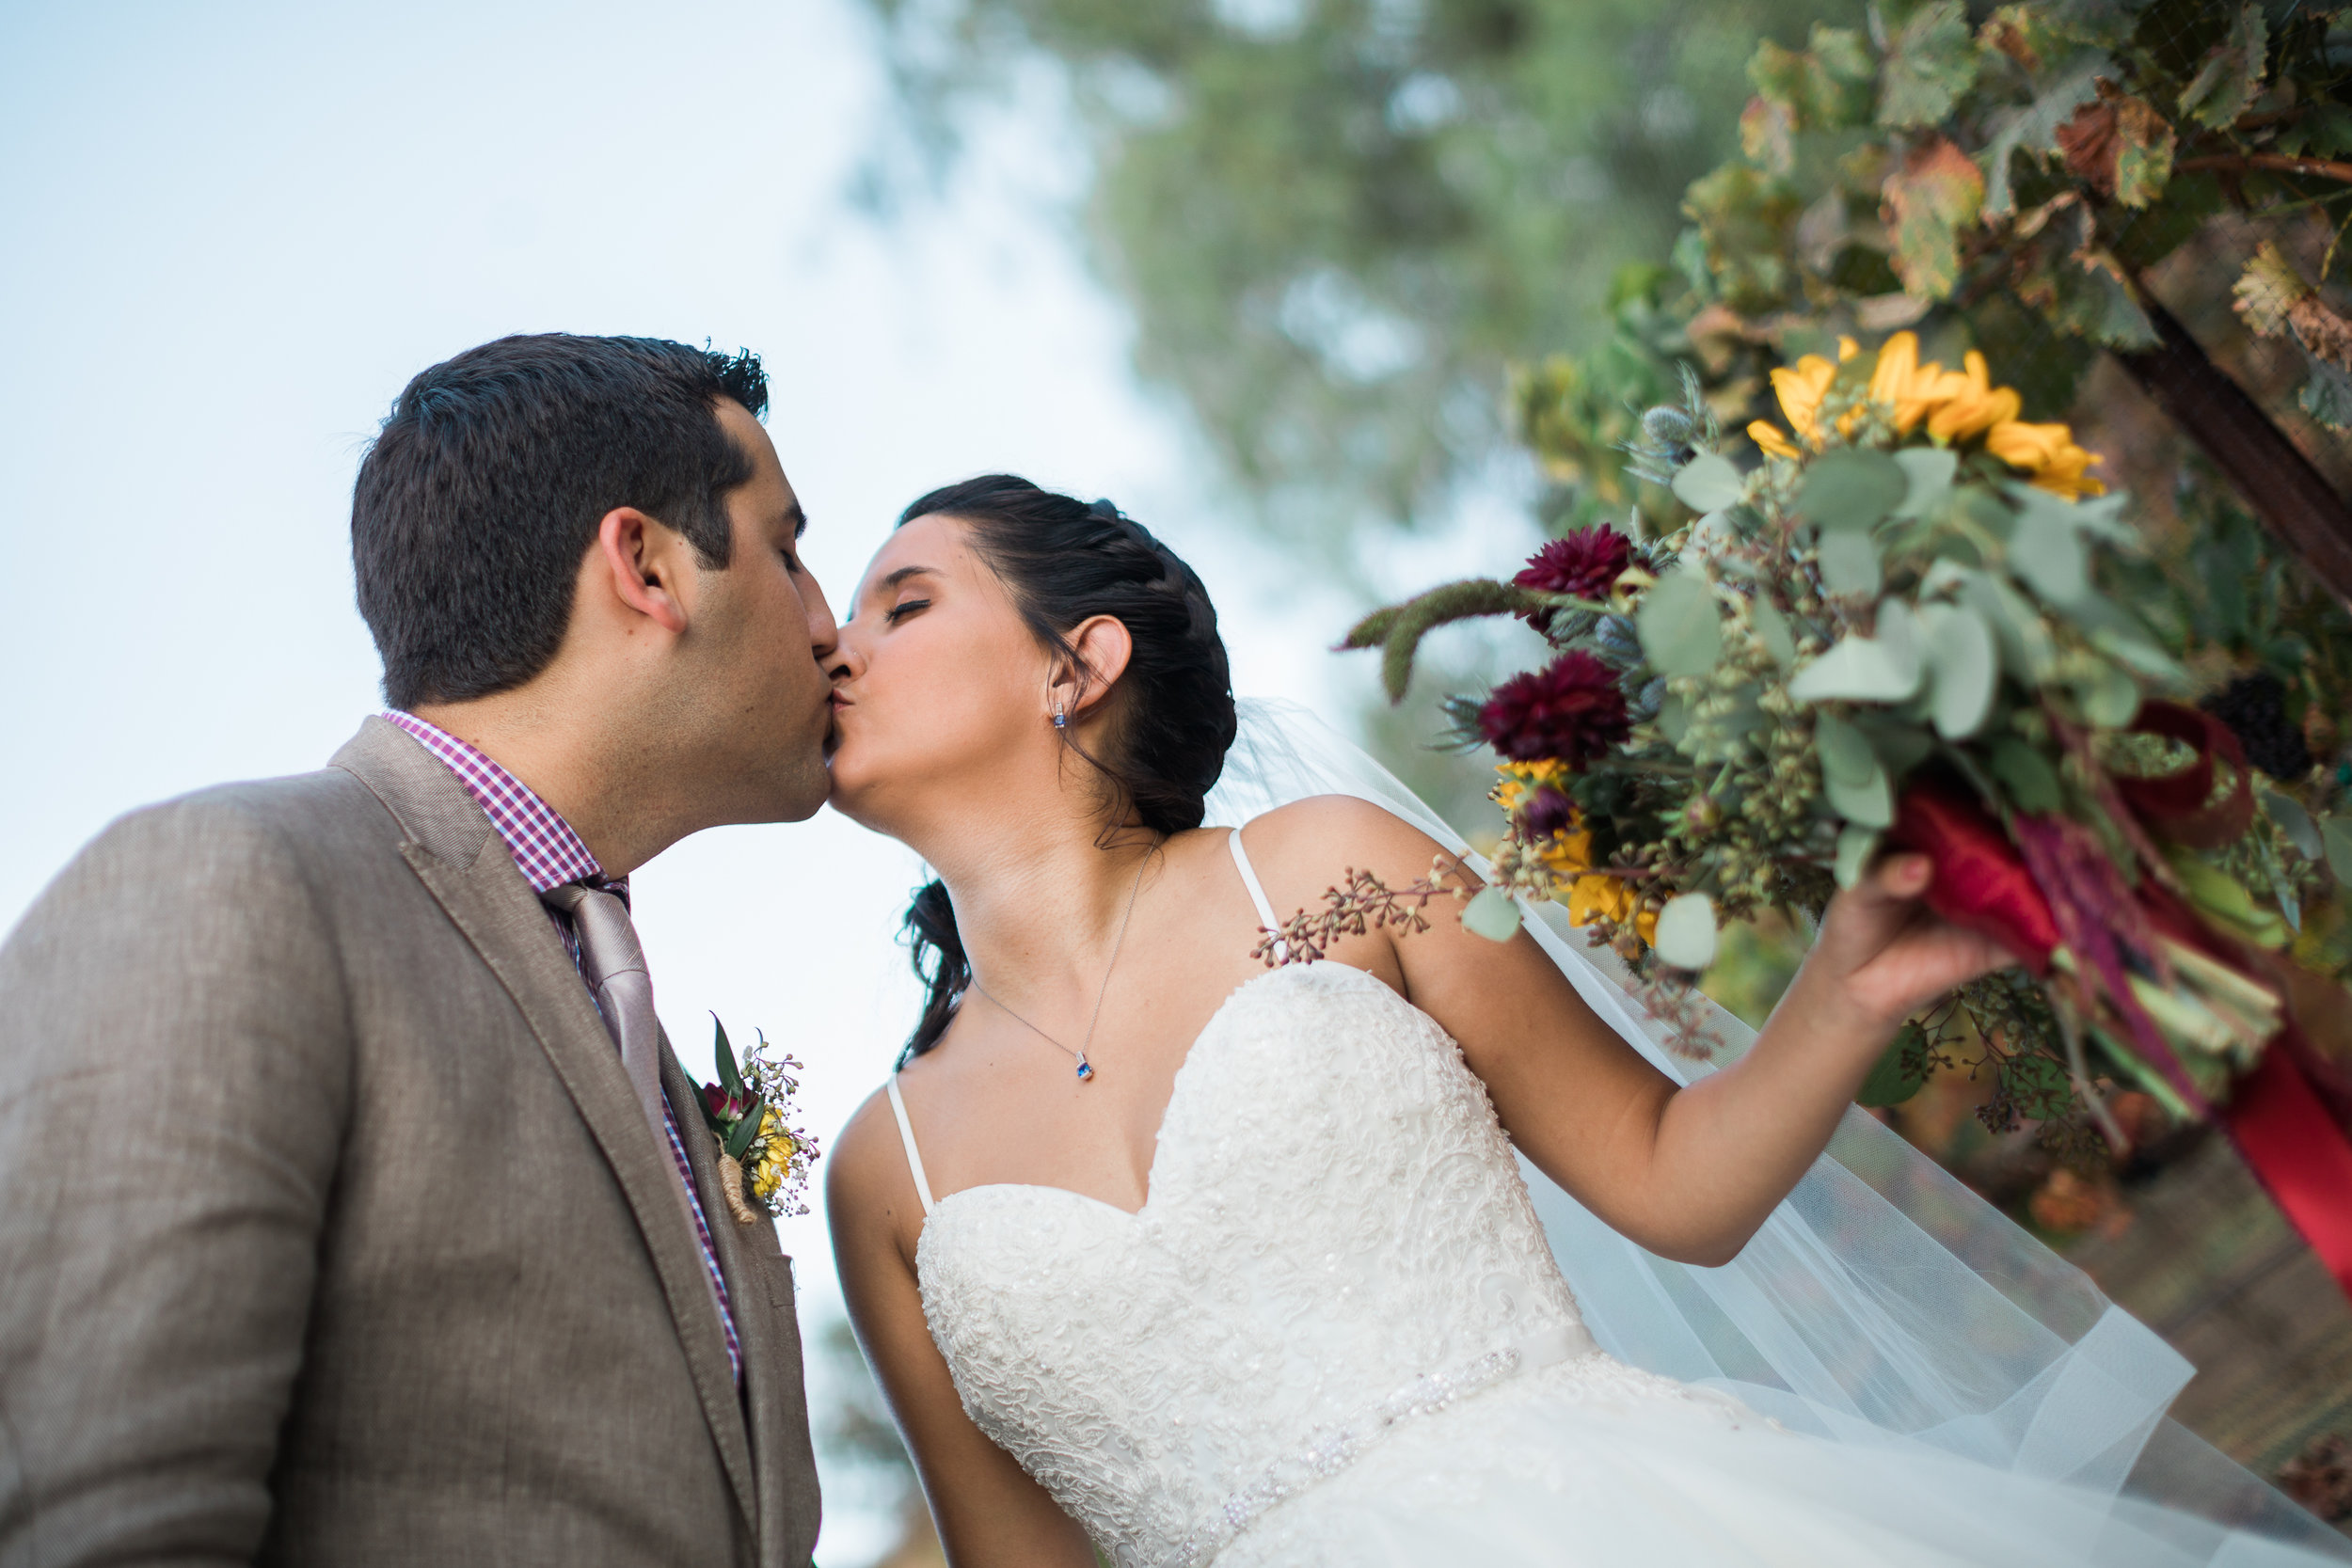 Johnson Wedding_Bridal Party + Romantics-74.jpg